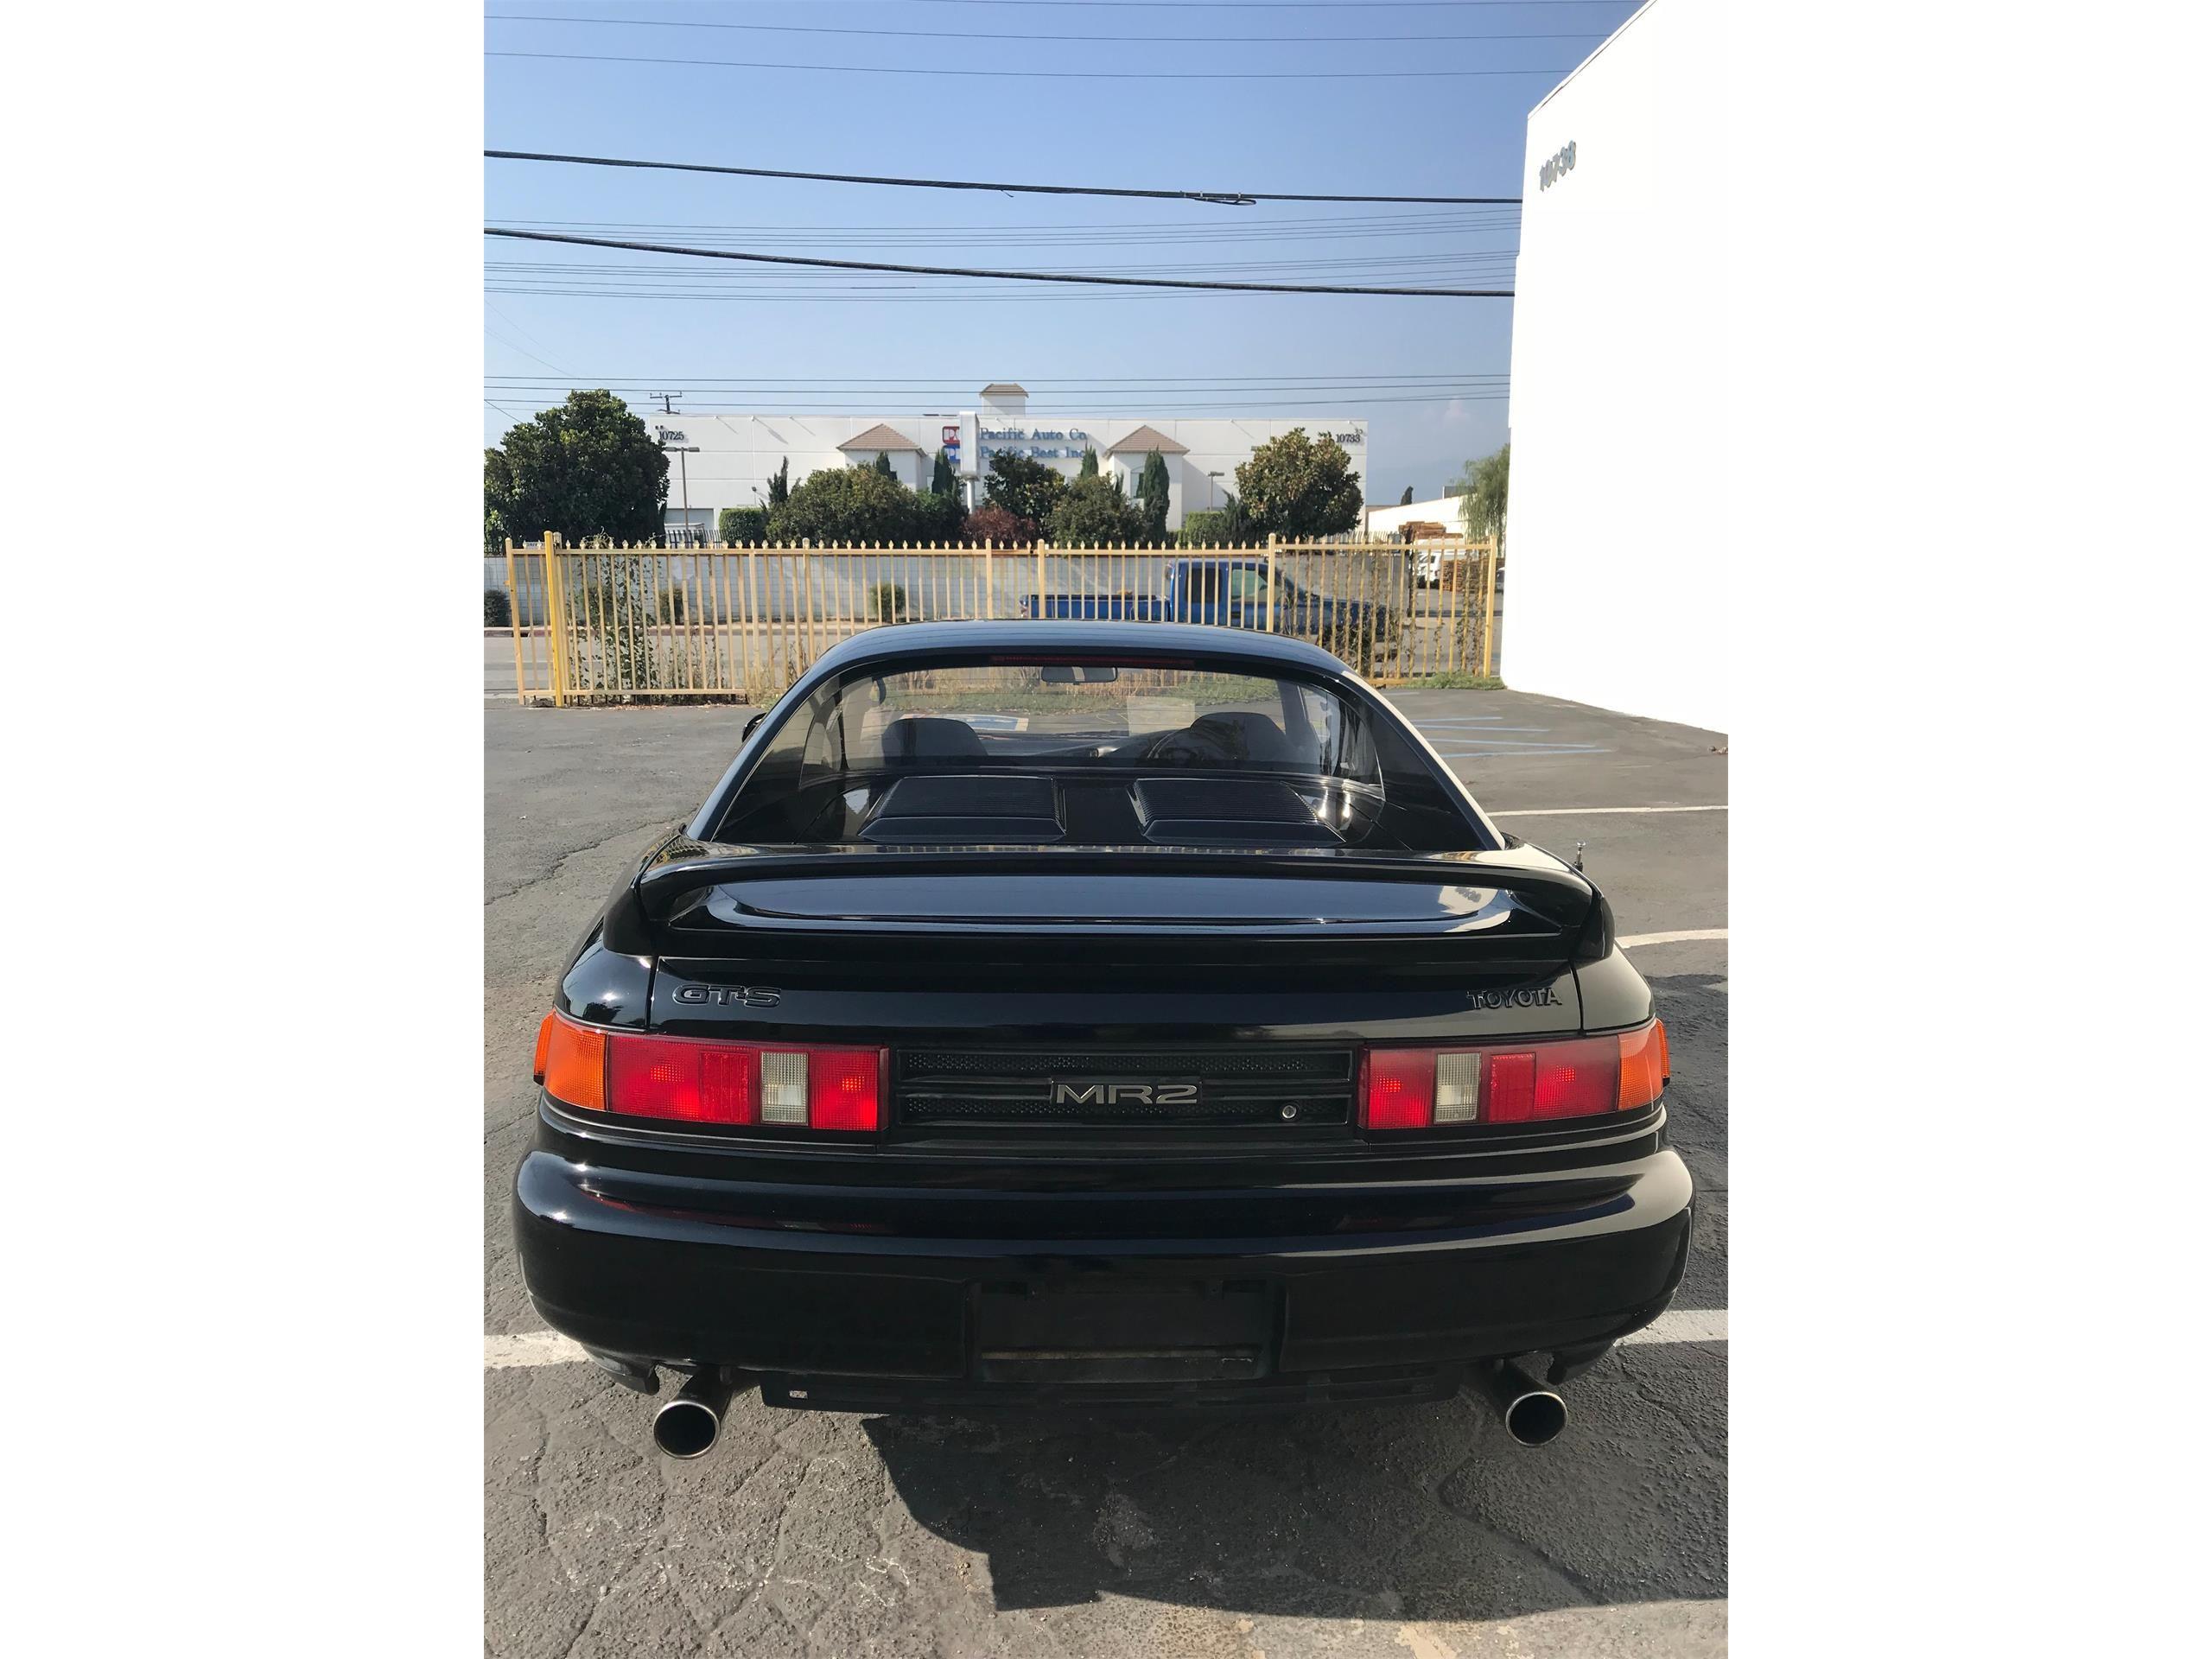 1992 Toyota Mr2 For Sale Listing Id Cc 1163549 Classiccars Com Driveyourdream Mr2 Sr20 Toyota Toyotamr2 Toyota Mr2 Mr2 For Sale Toyota